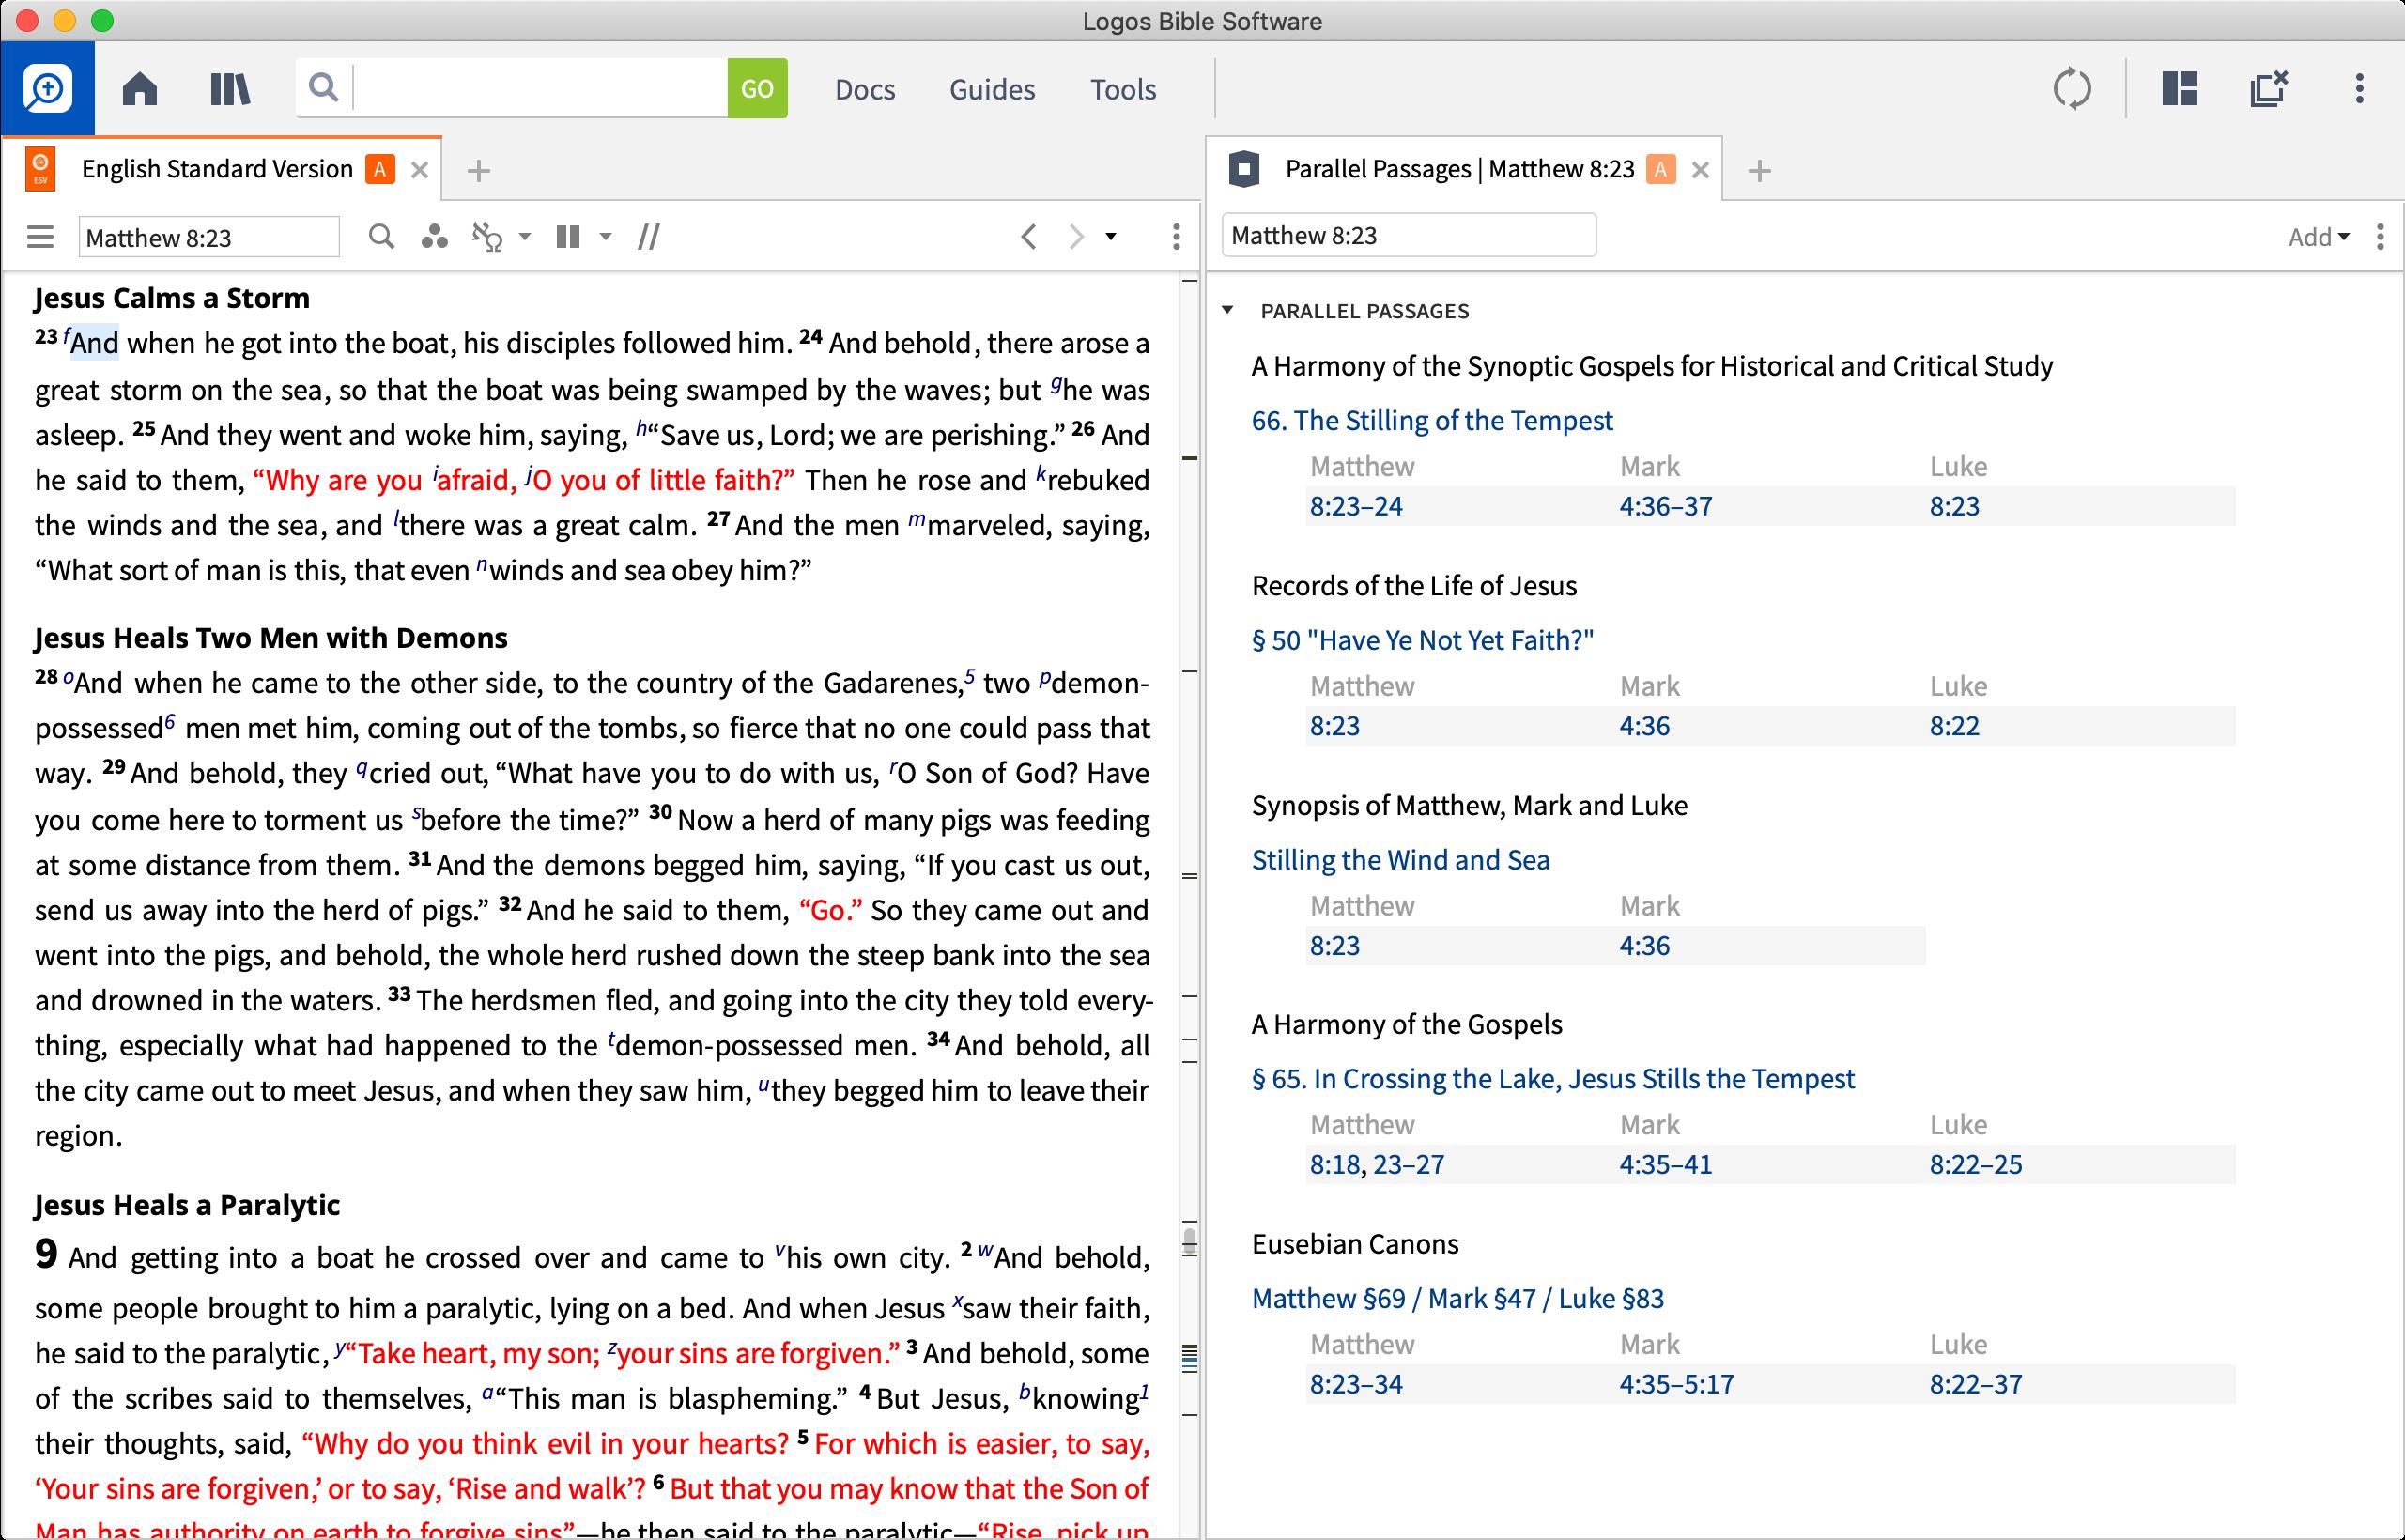 Features | Logos Bible Software